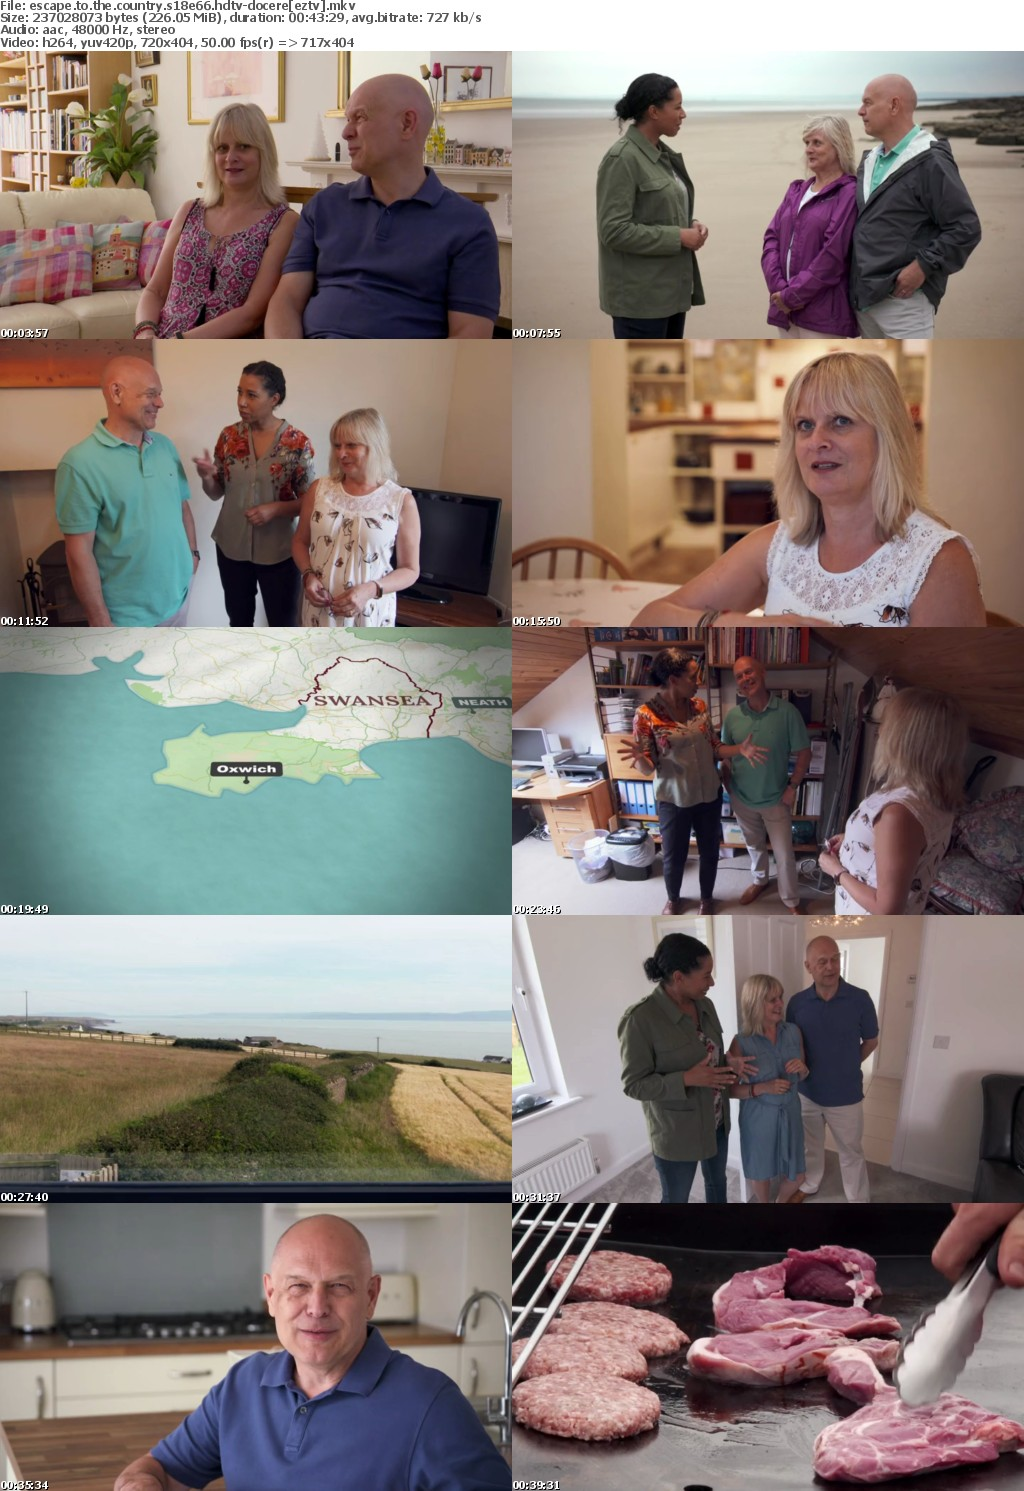 Escape to the Country S18E66 HDTV x264-DOCERE